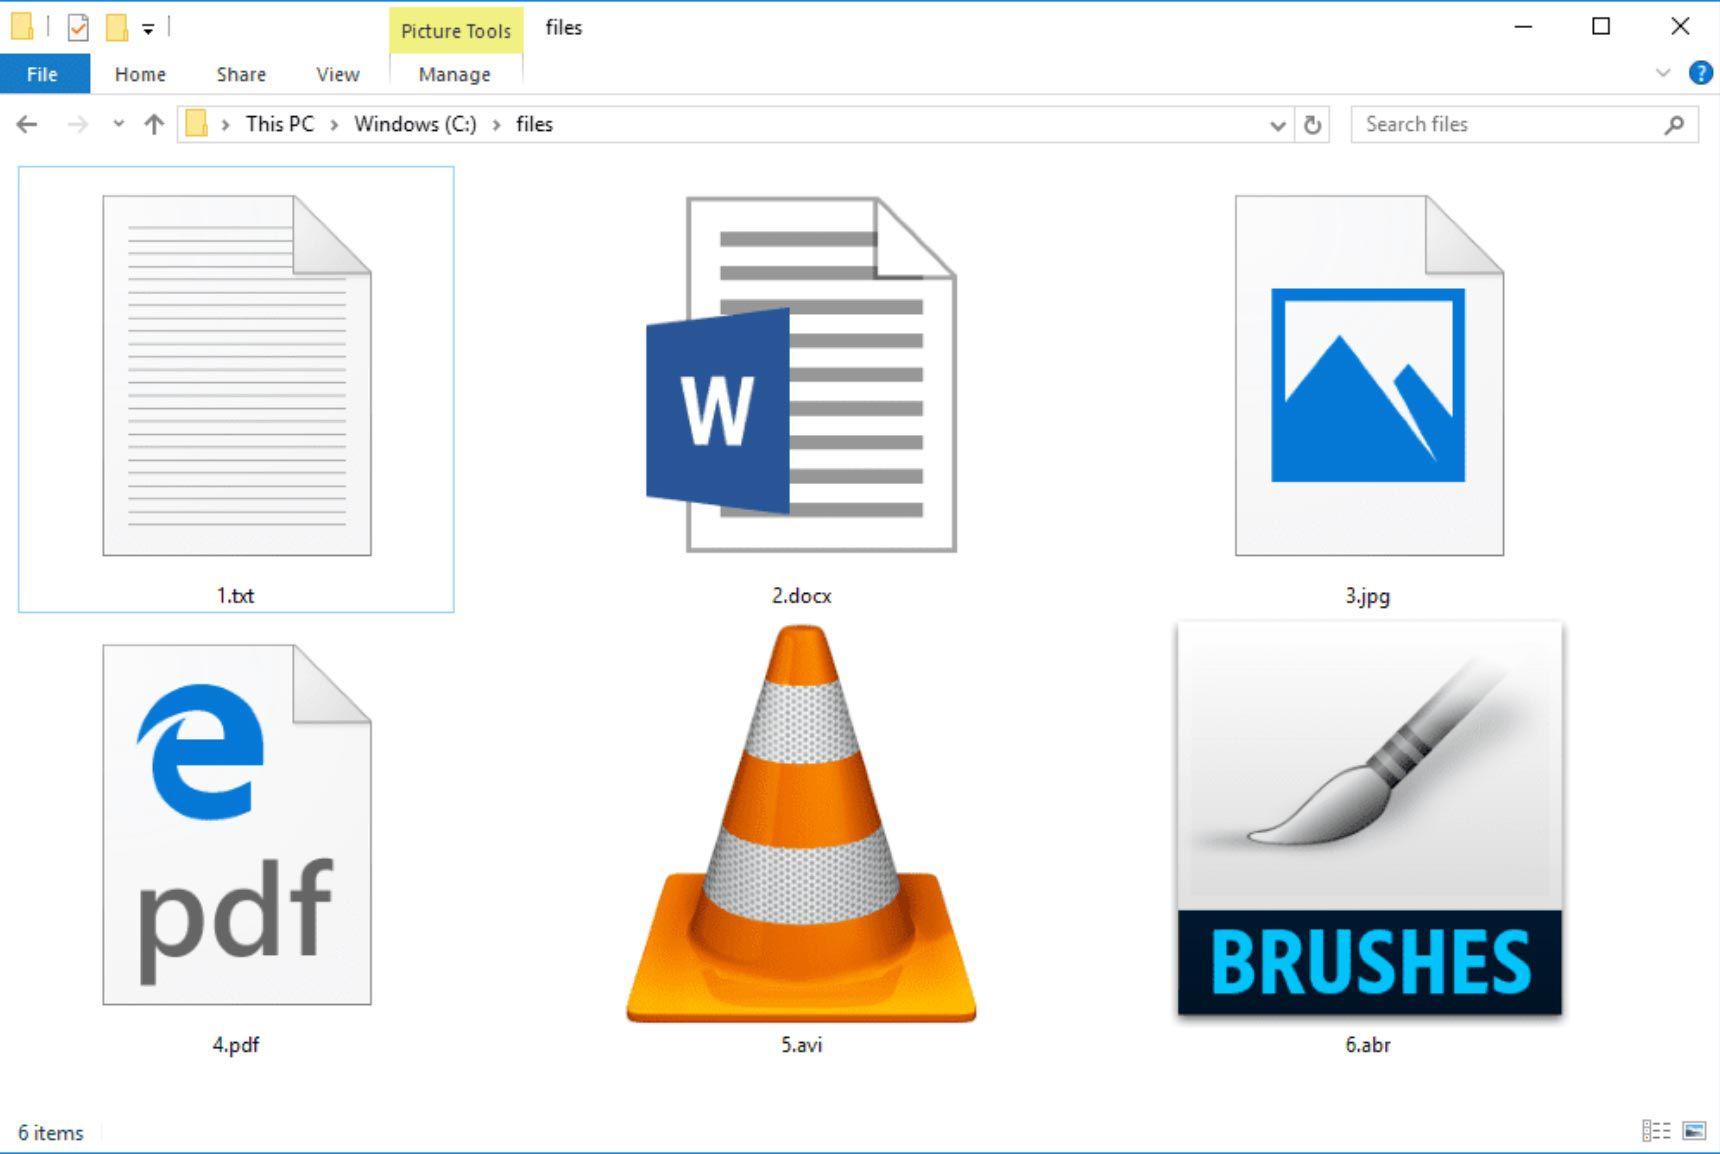 Screenshot of various files in a folder